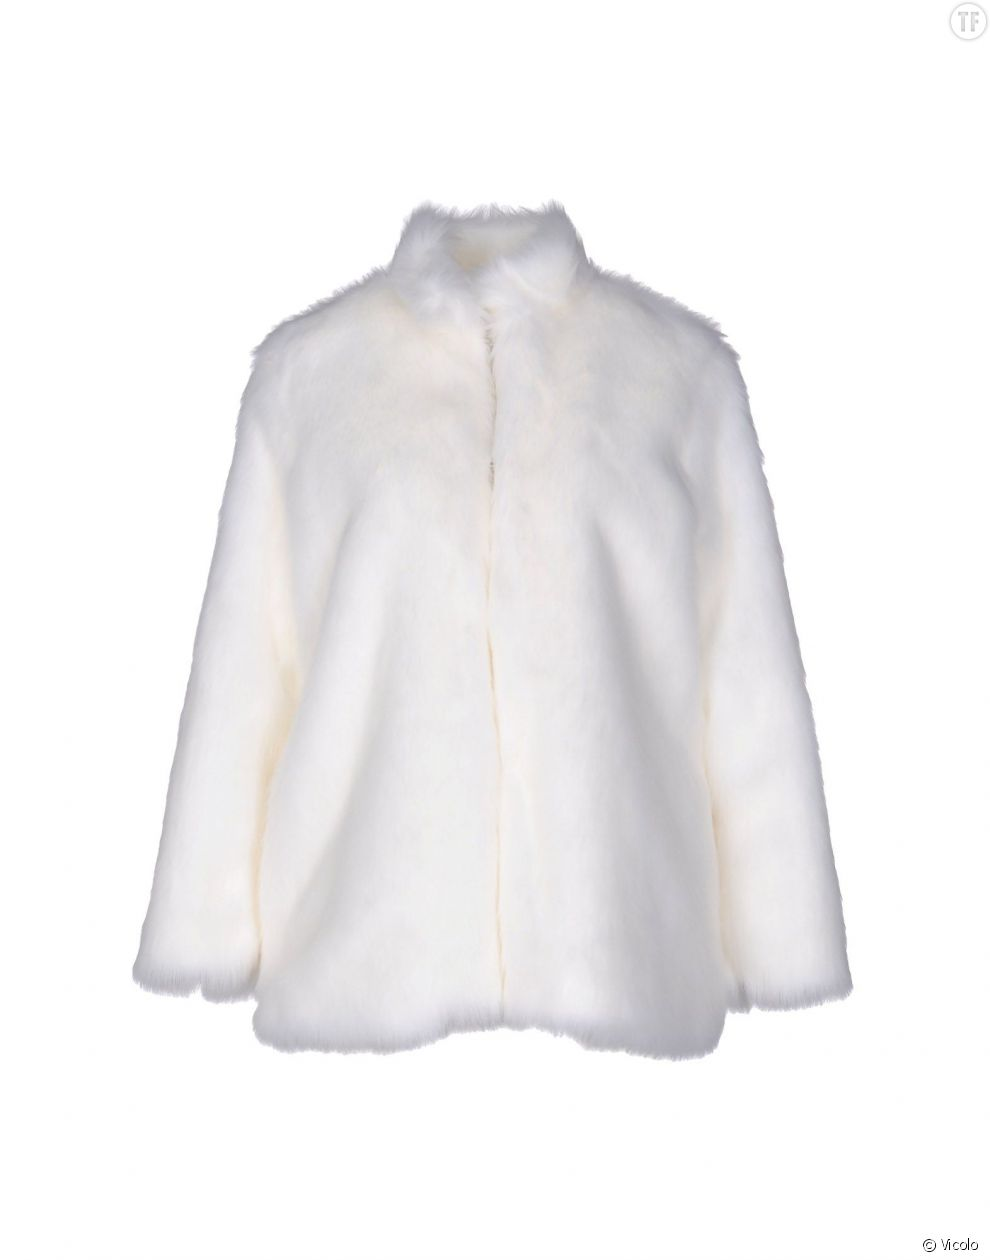 Manteau blanc en fausse fourrure Vicolo 76 euros